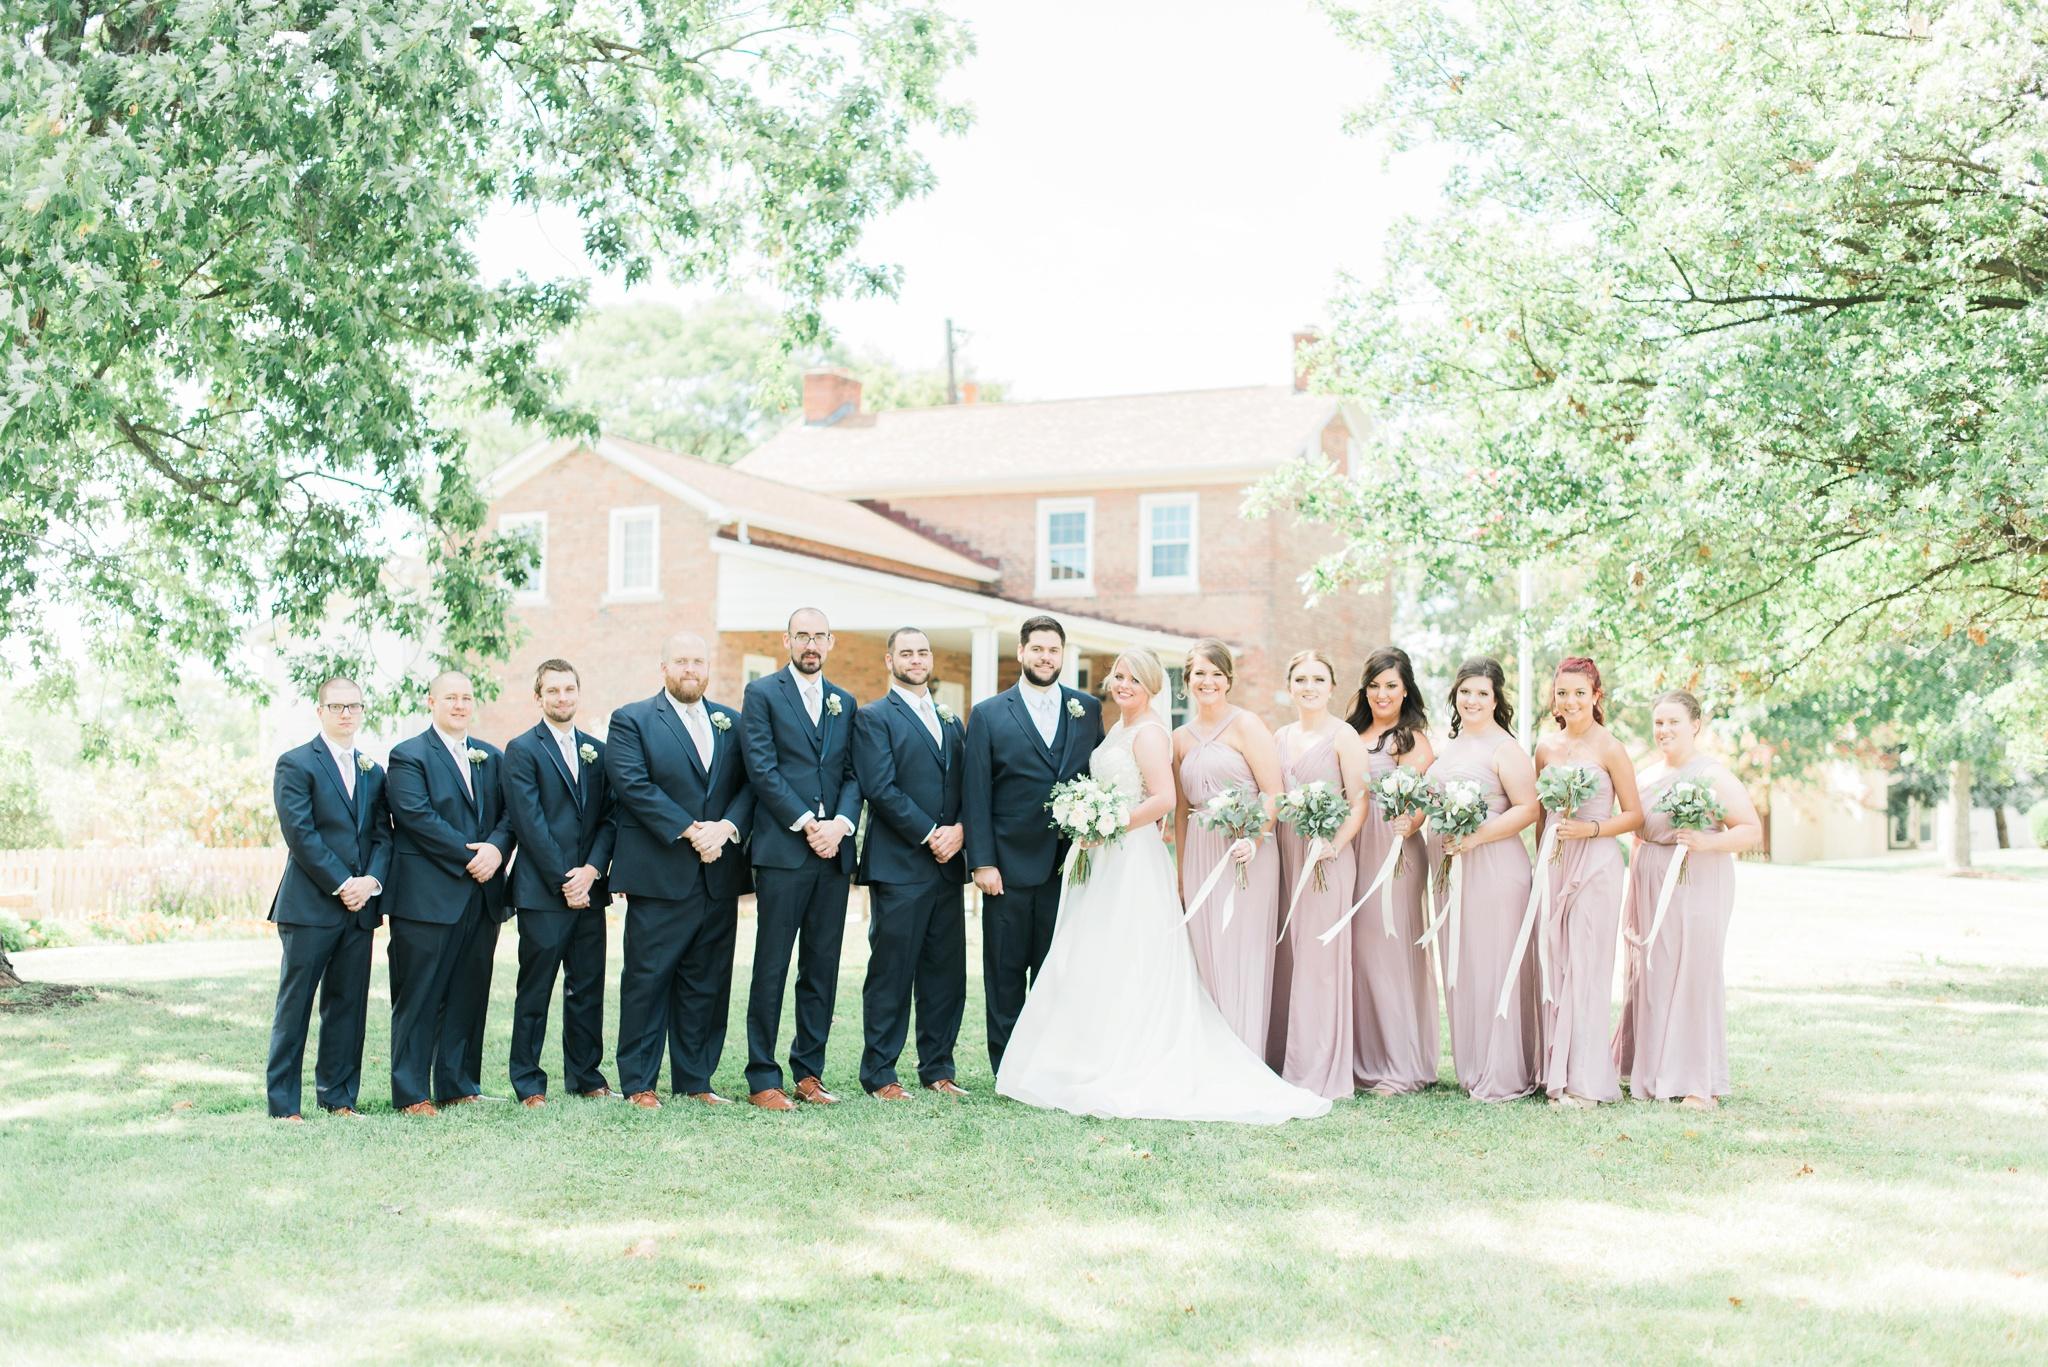 aladdin-shrine-center-wedding-grove-city-ohio-amber-jared_0053.jpg